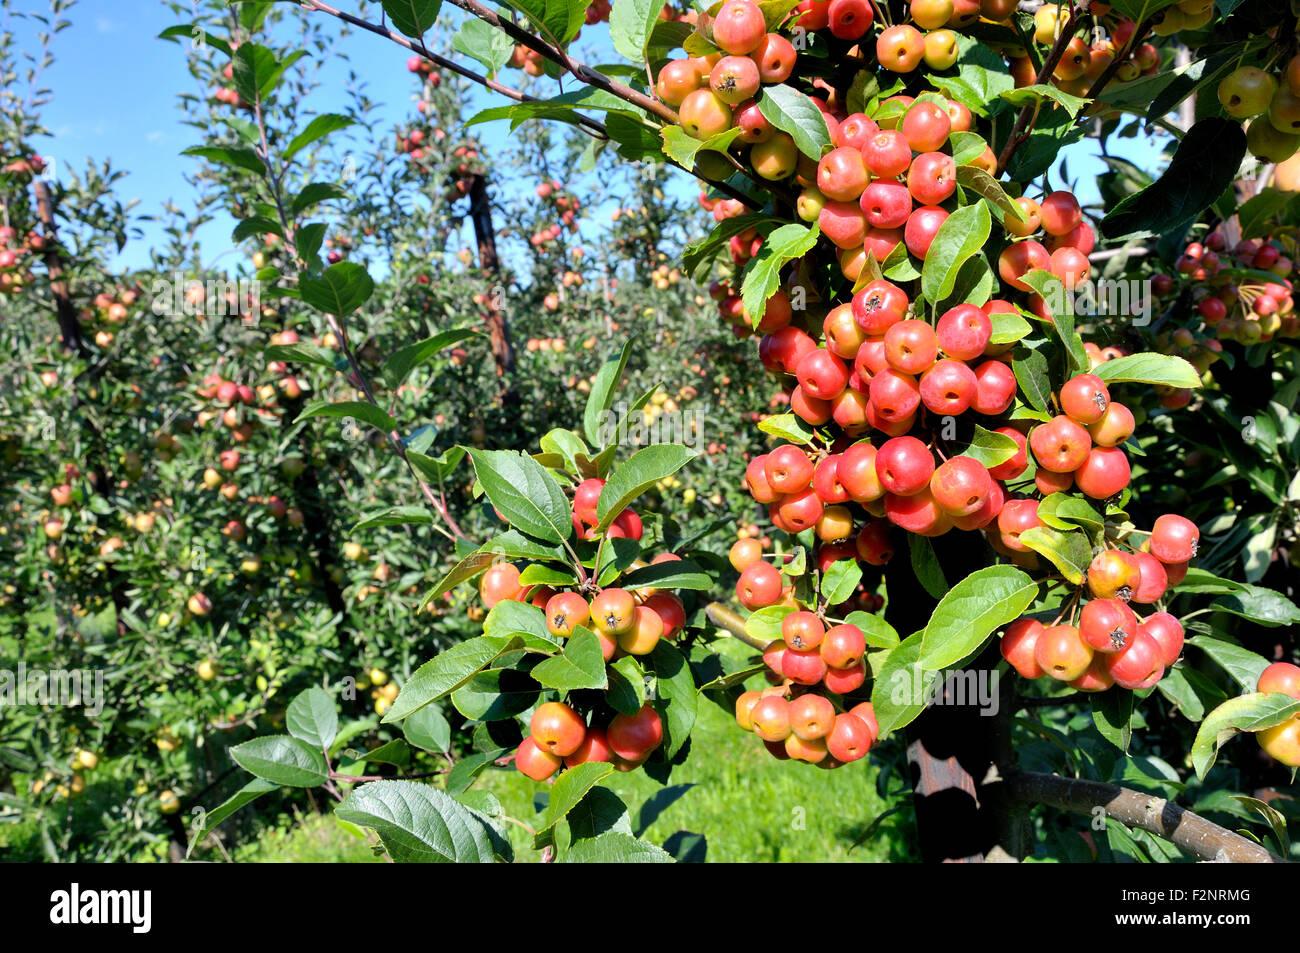 Boughton Monchelsea village, Maidstone, Kent, UK. Commercial apple orchard. Crab apple 'pollinator' trees - Stock Image